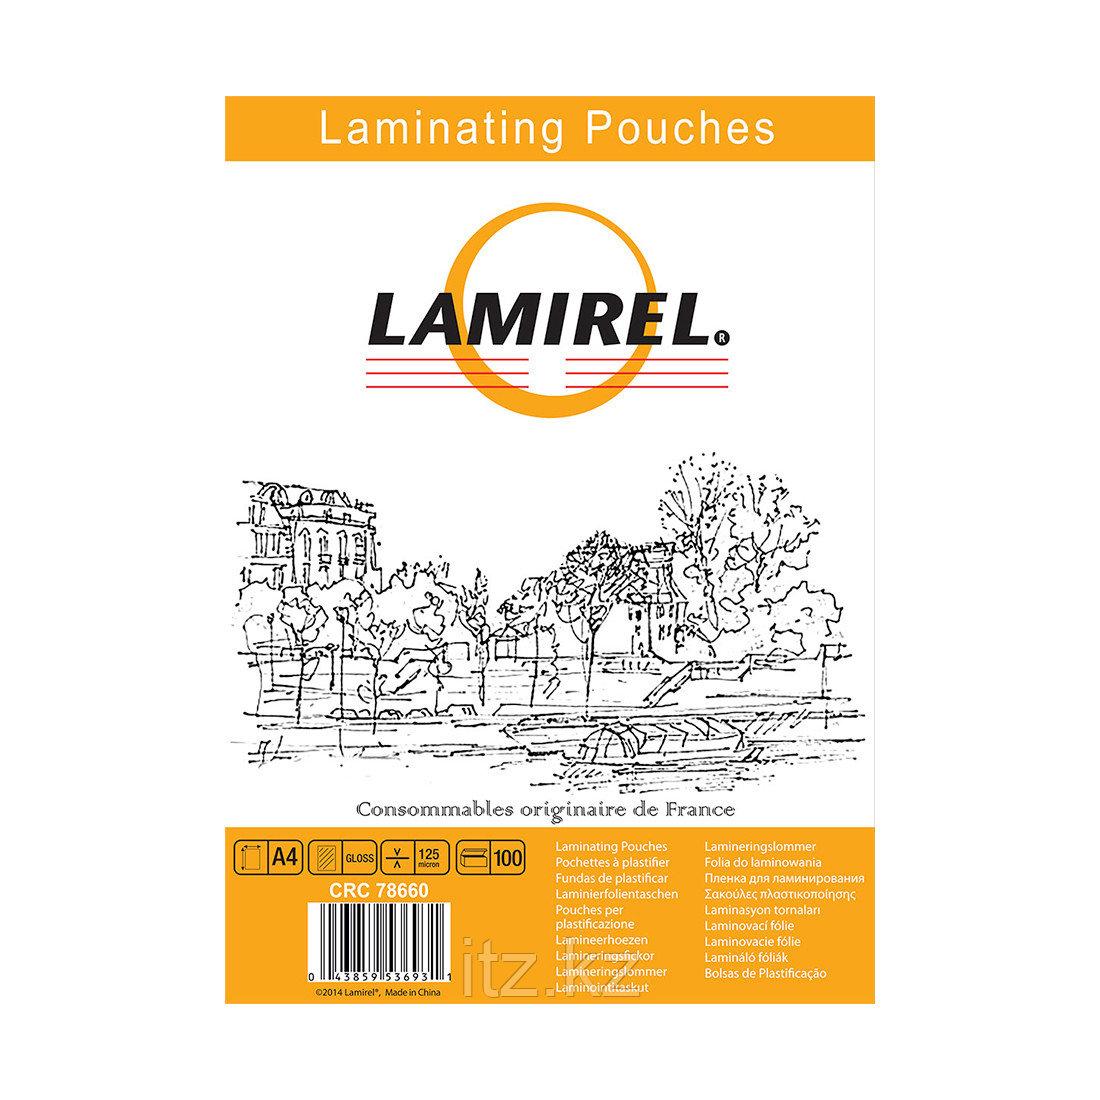 Пленка для ламинирования  Lamirel LA-78660 А4, 125мкм, 100 шт.